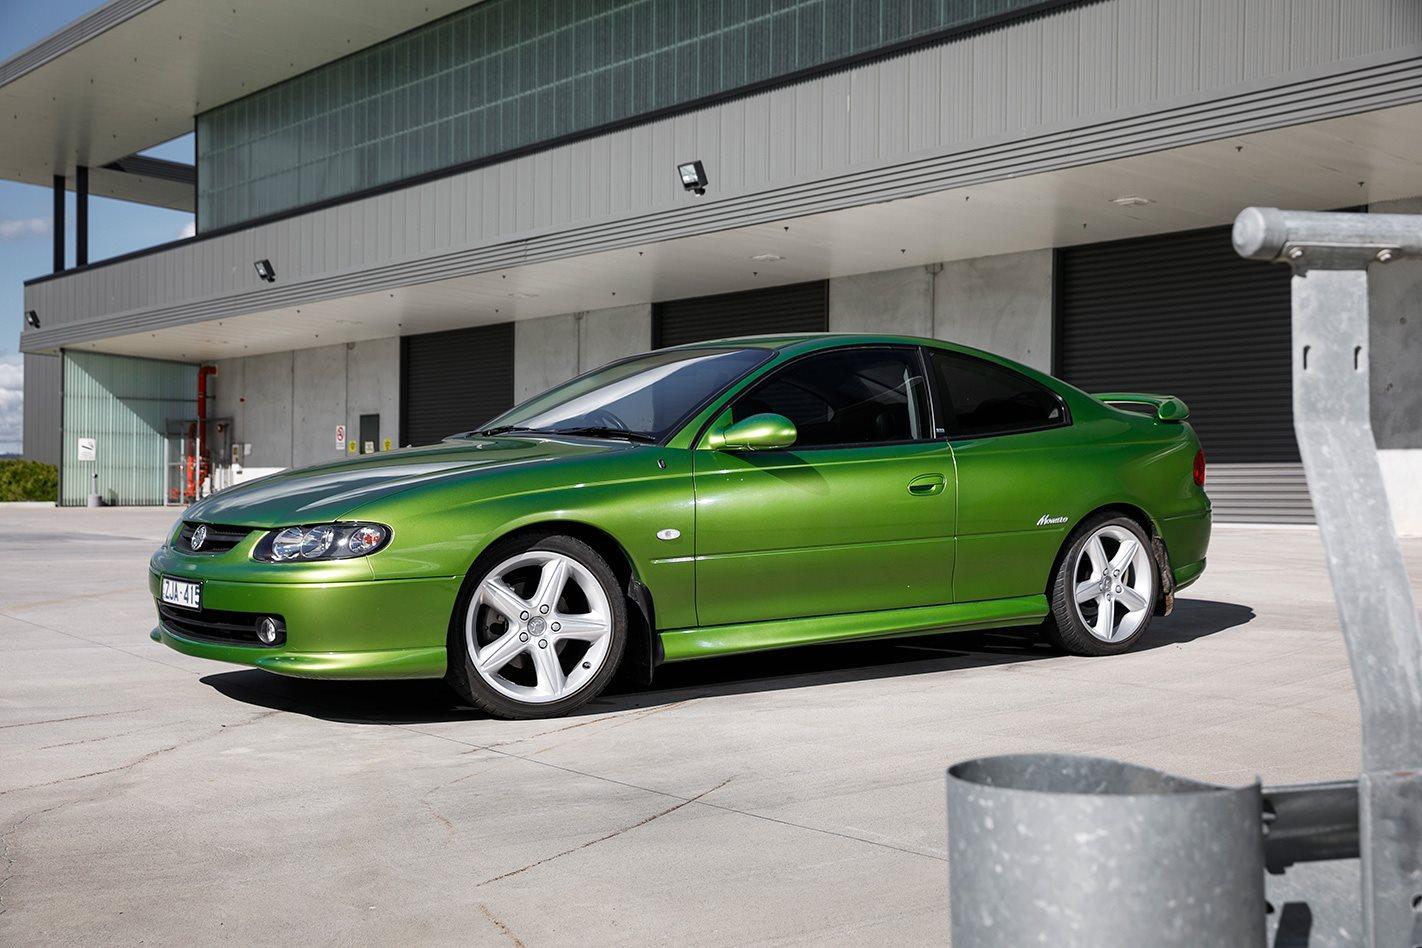 Holden Monaro exterior.jpg